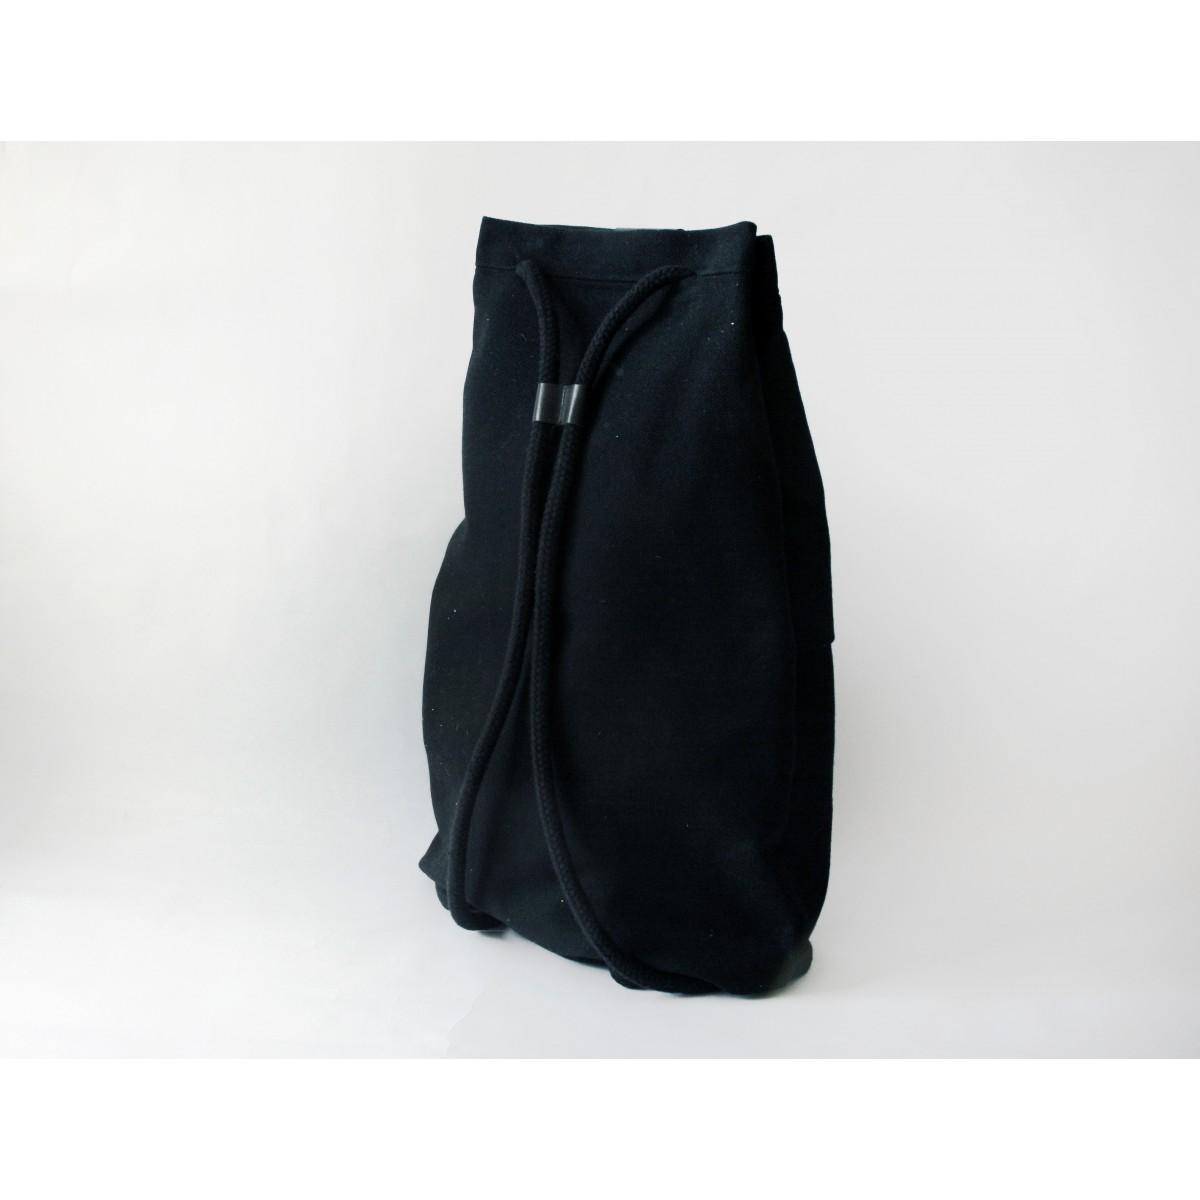 Drawstring Rucksack FANT/black